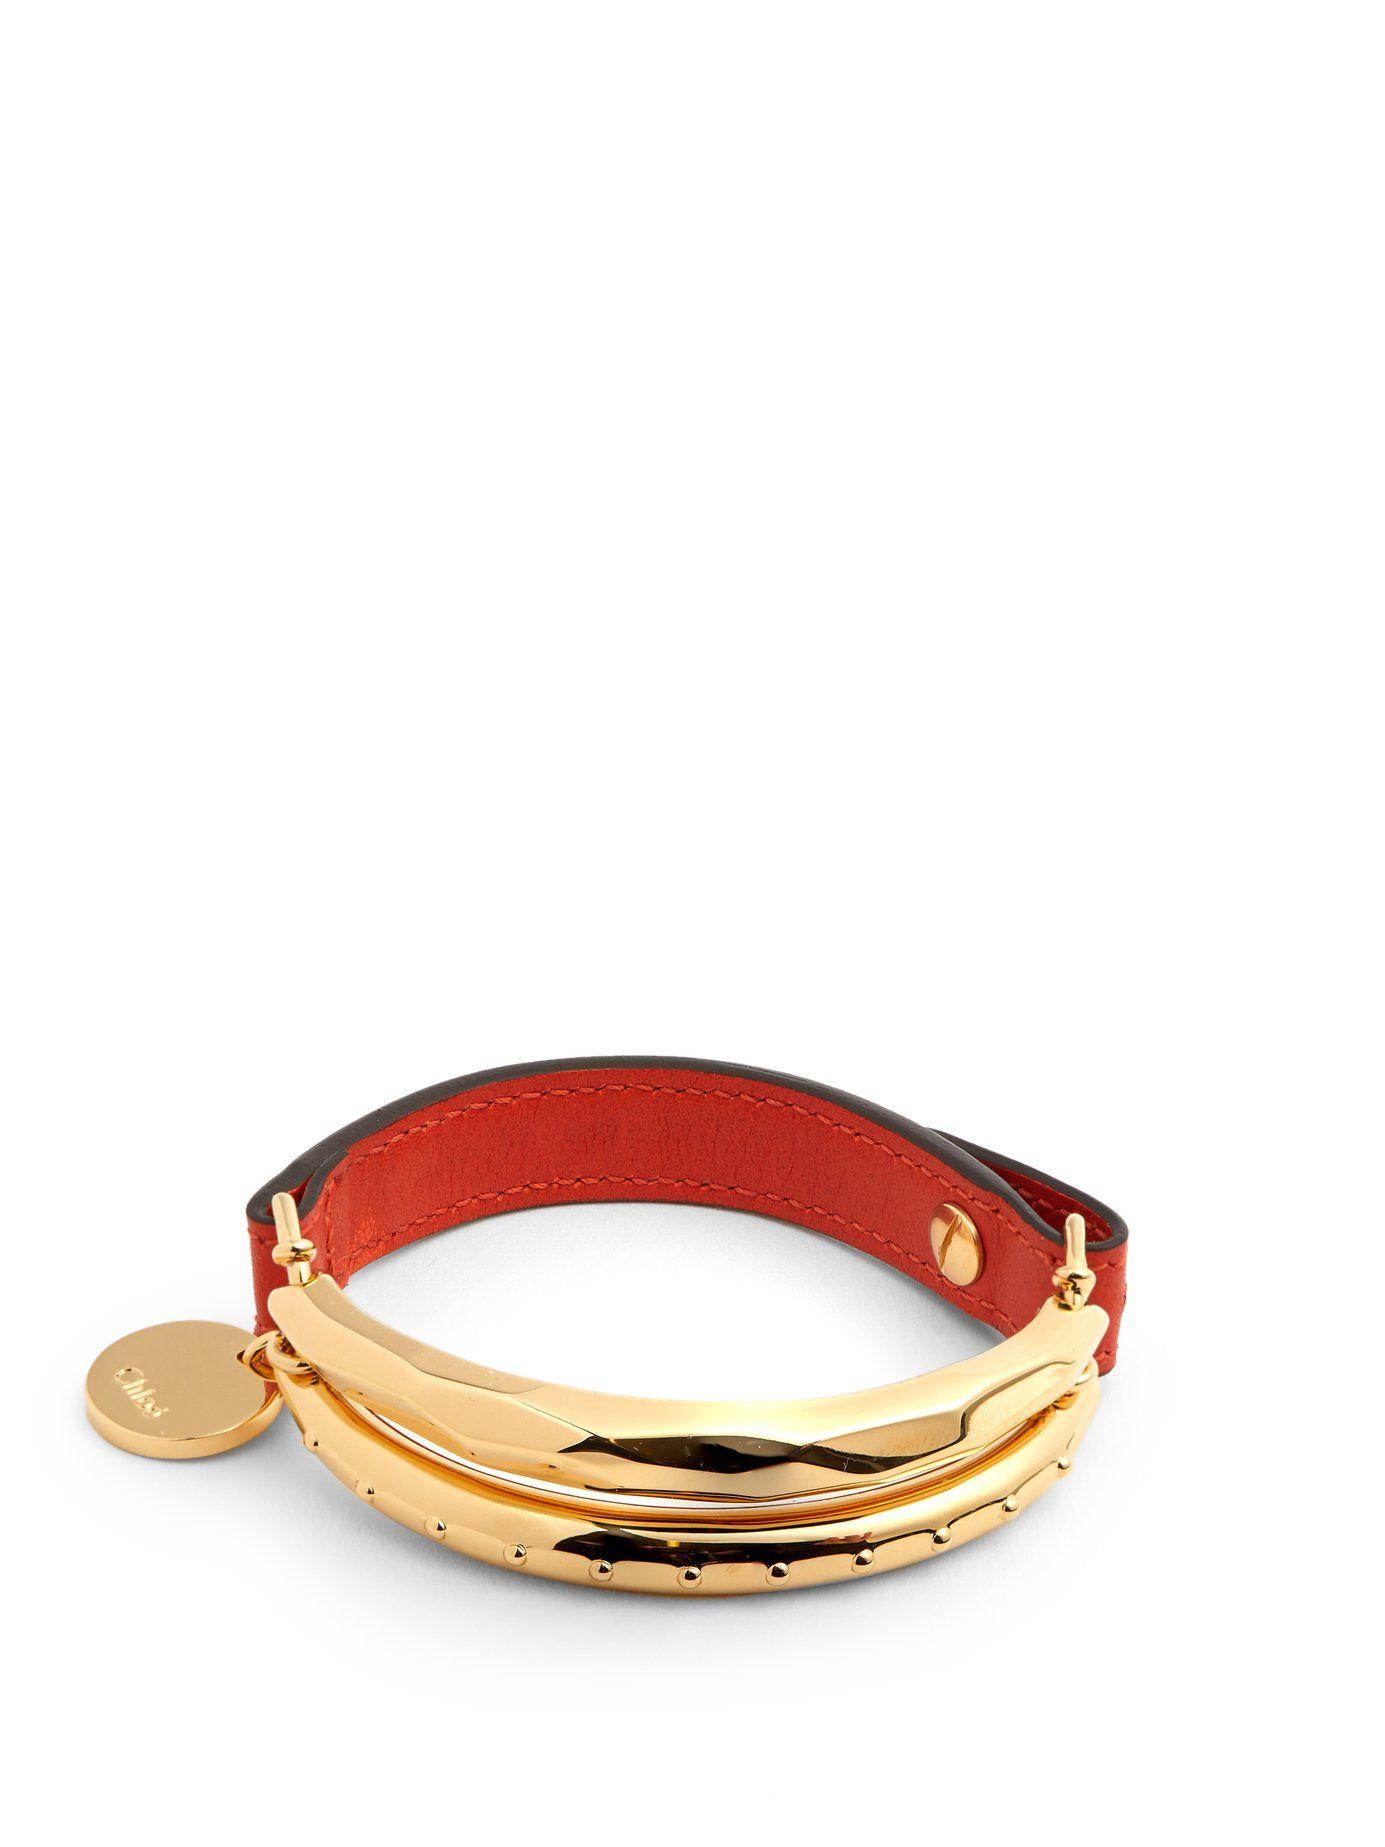 Chloé Nile leather bracelet SRP3Tmo